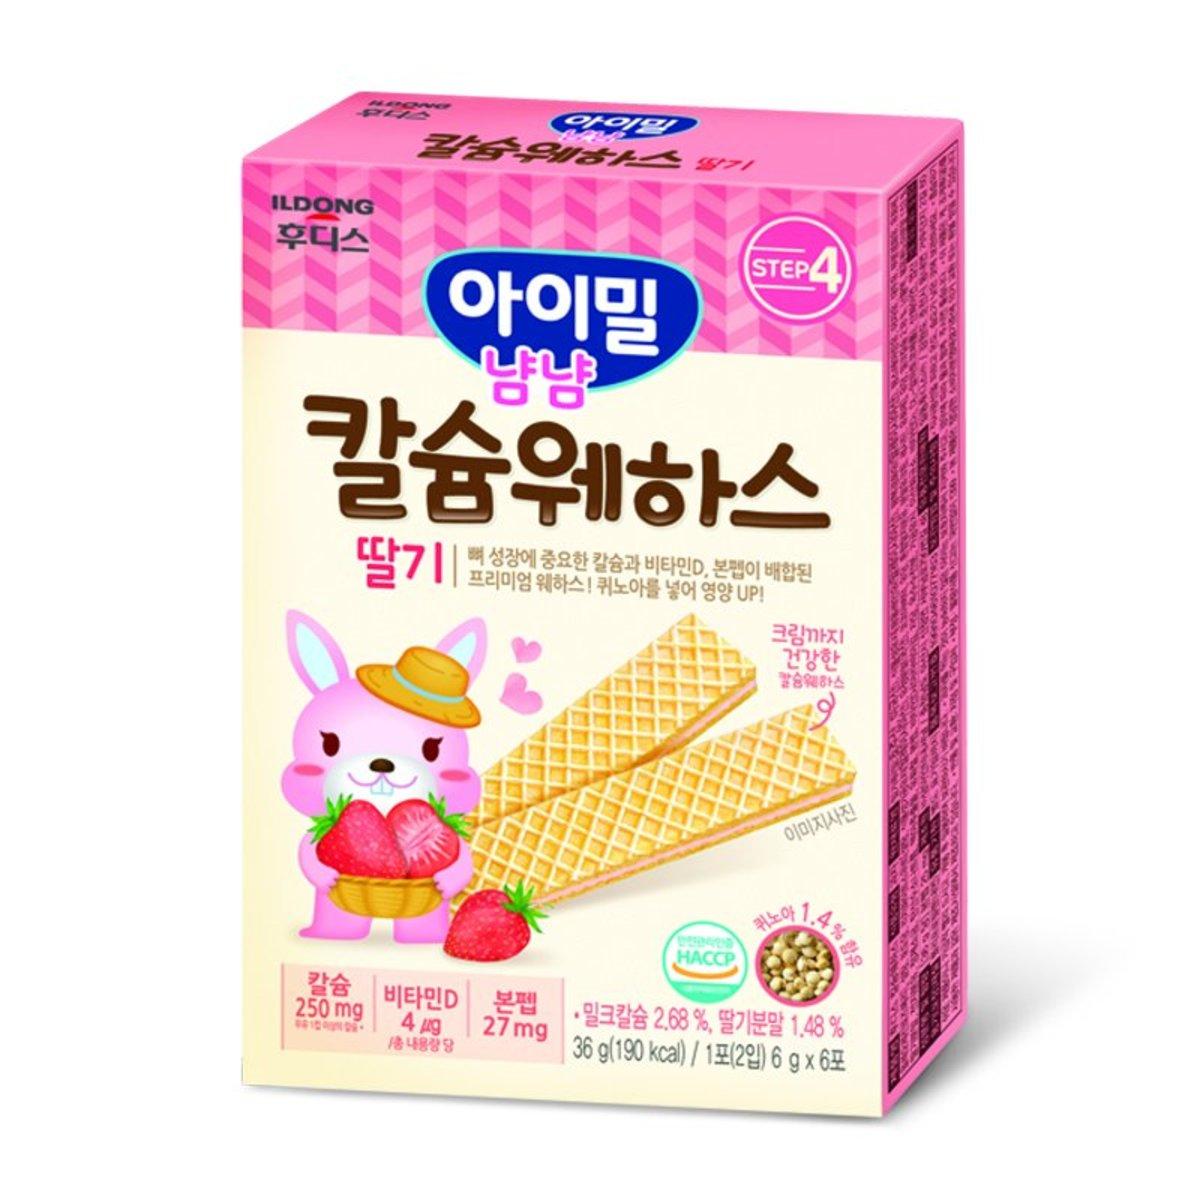 ILDONG Quinoa Wafer Colostrum ( Calcium + Strawberry )